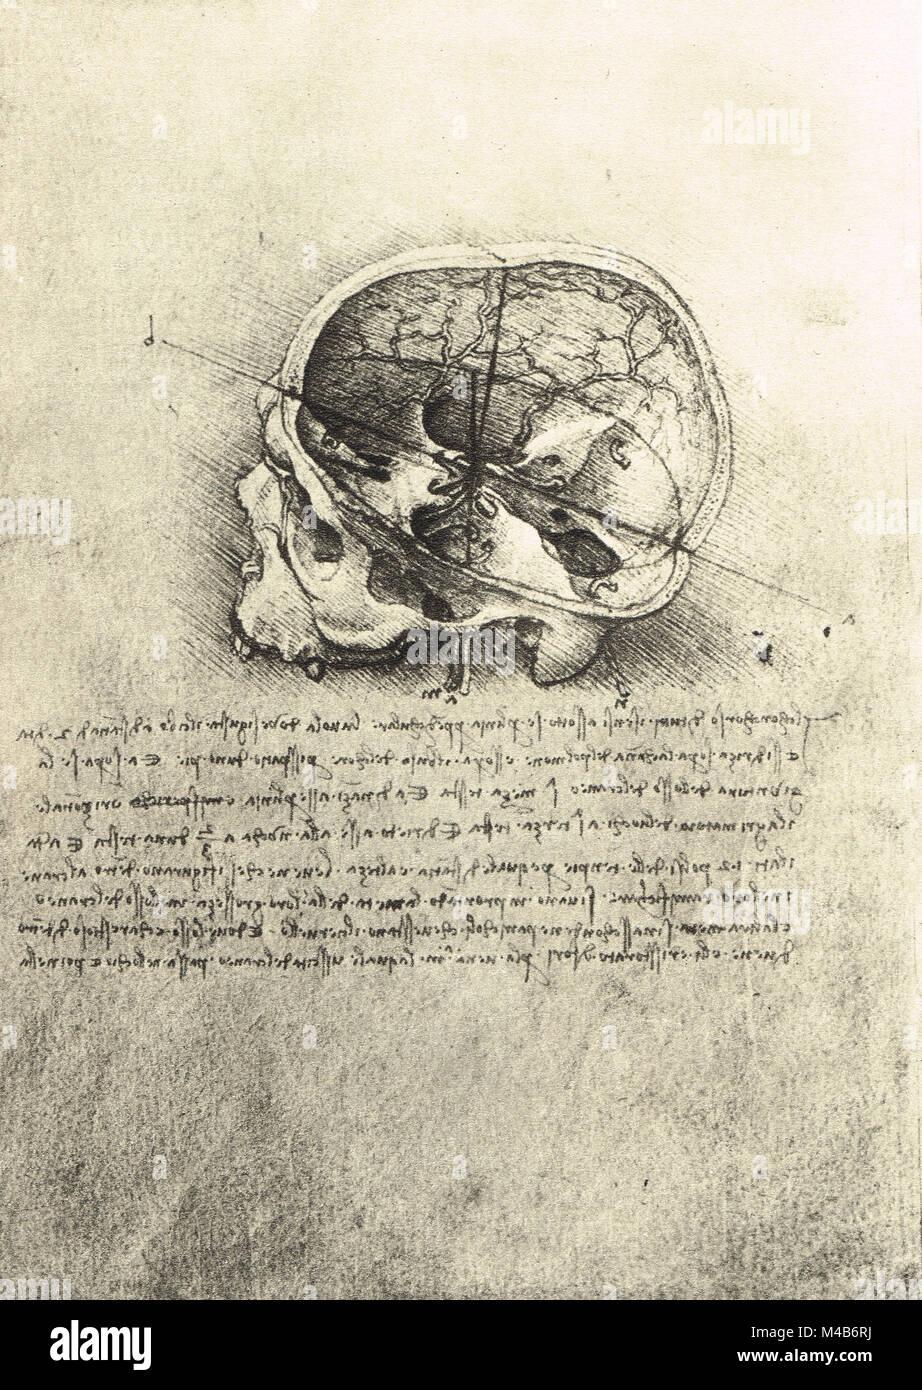 Anatomical study of a skull from the left, drawn by Leonardo Da Vinci, circa 1489 - Stock Image